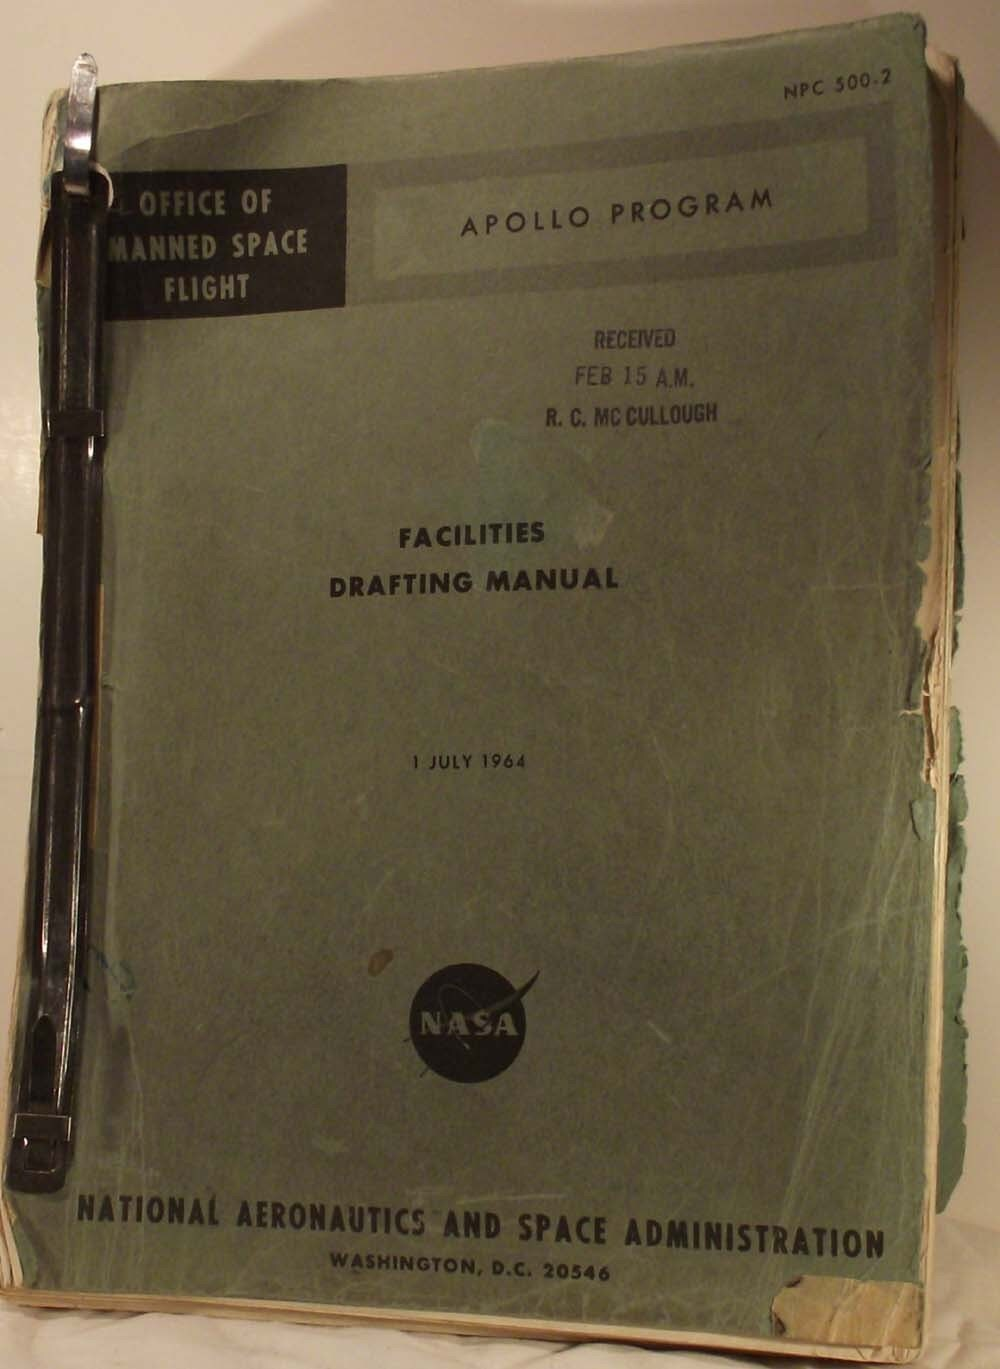 Apollo Program Facilities Drafting Manual 1964